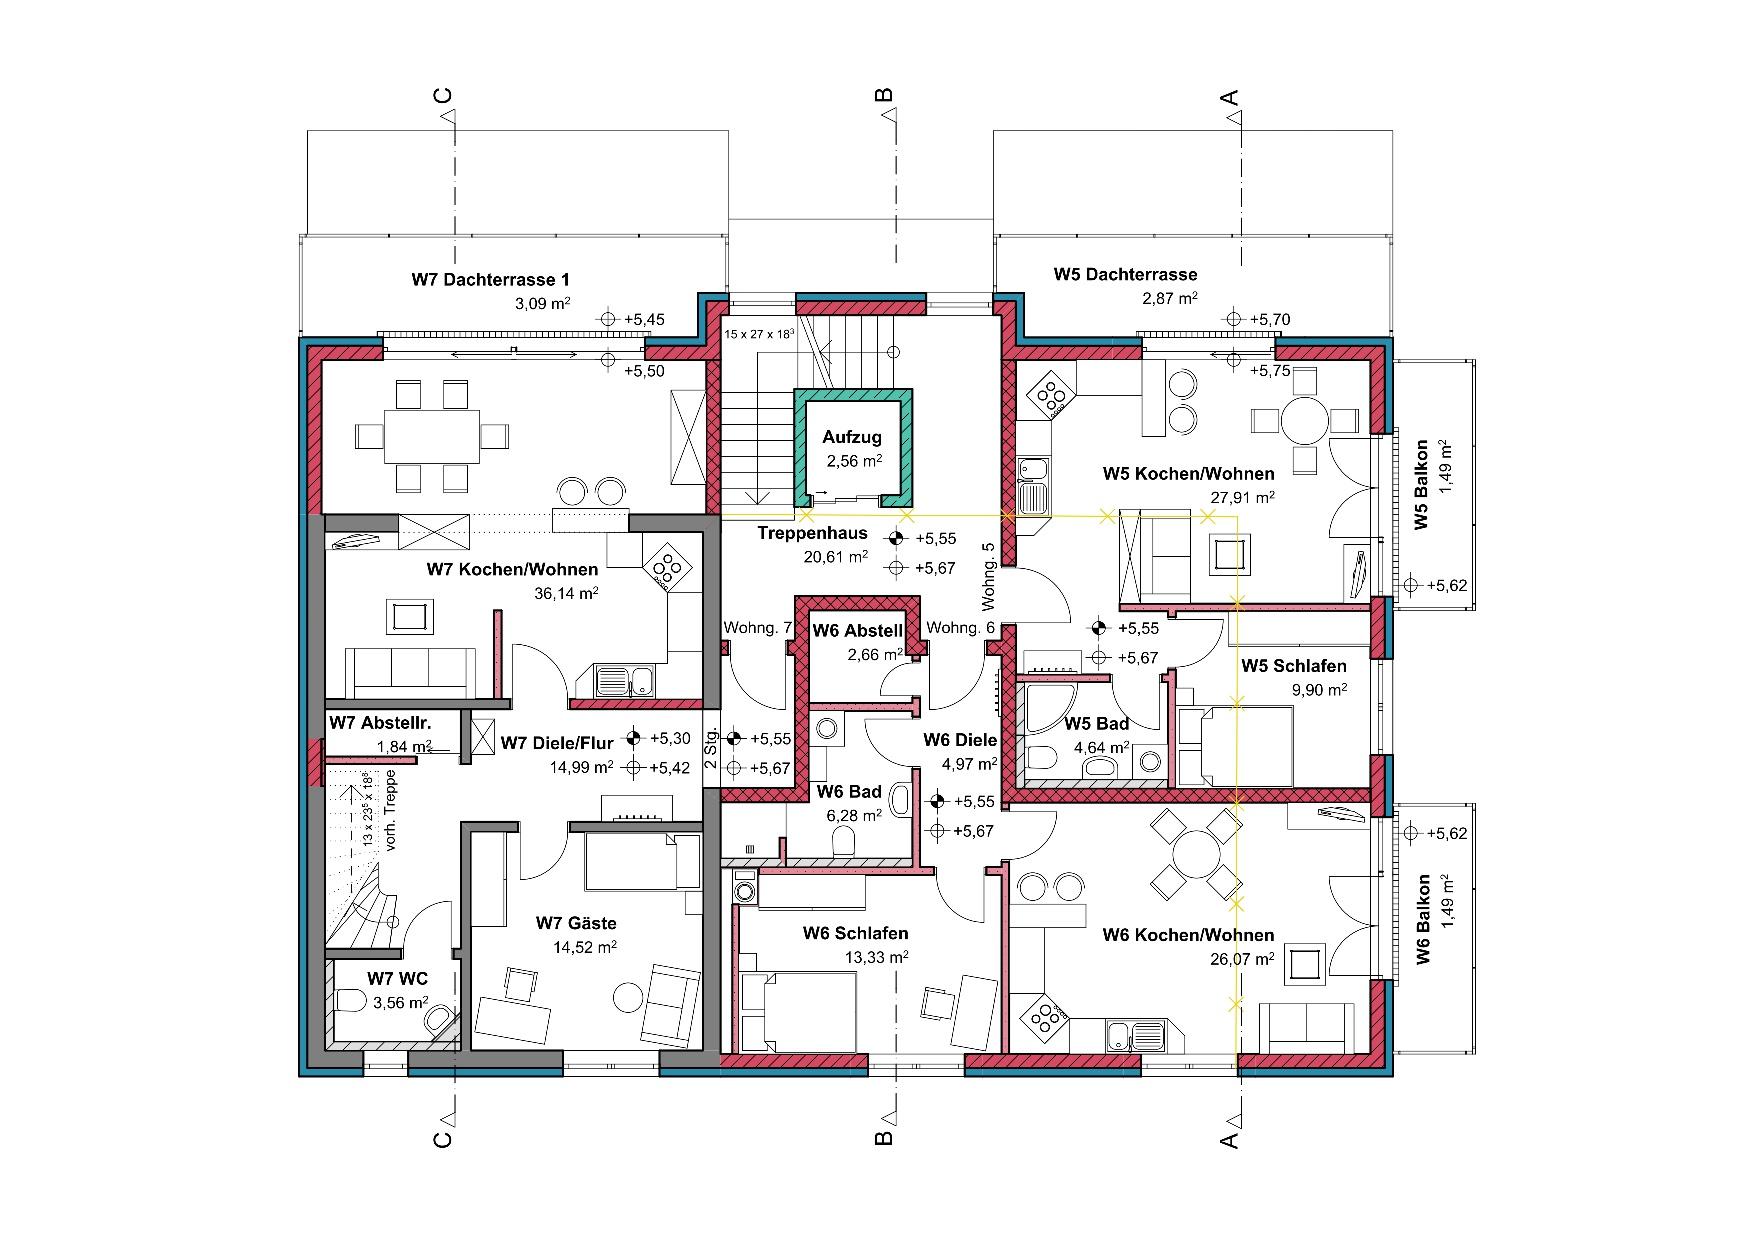 Grundriss, 2. Obergeschoss, Mehrfamilienhaus in Winnenden